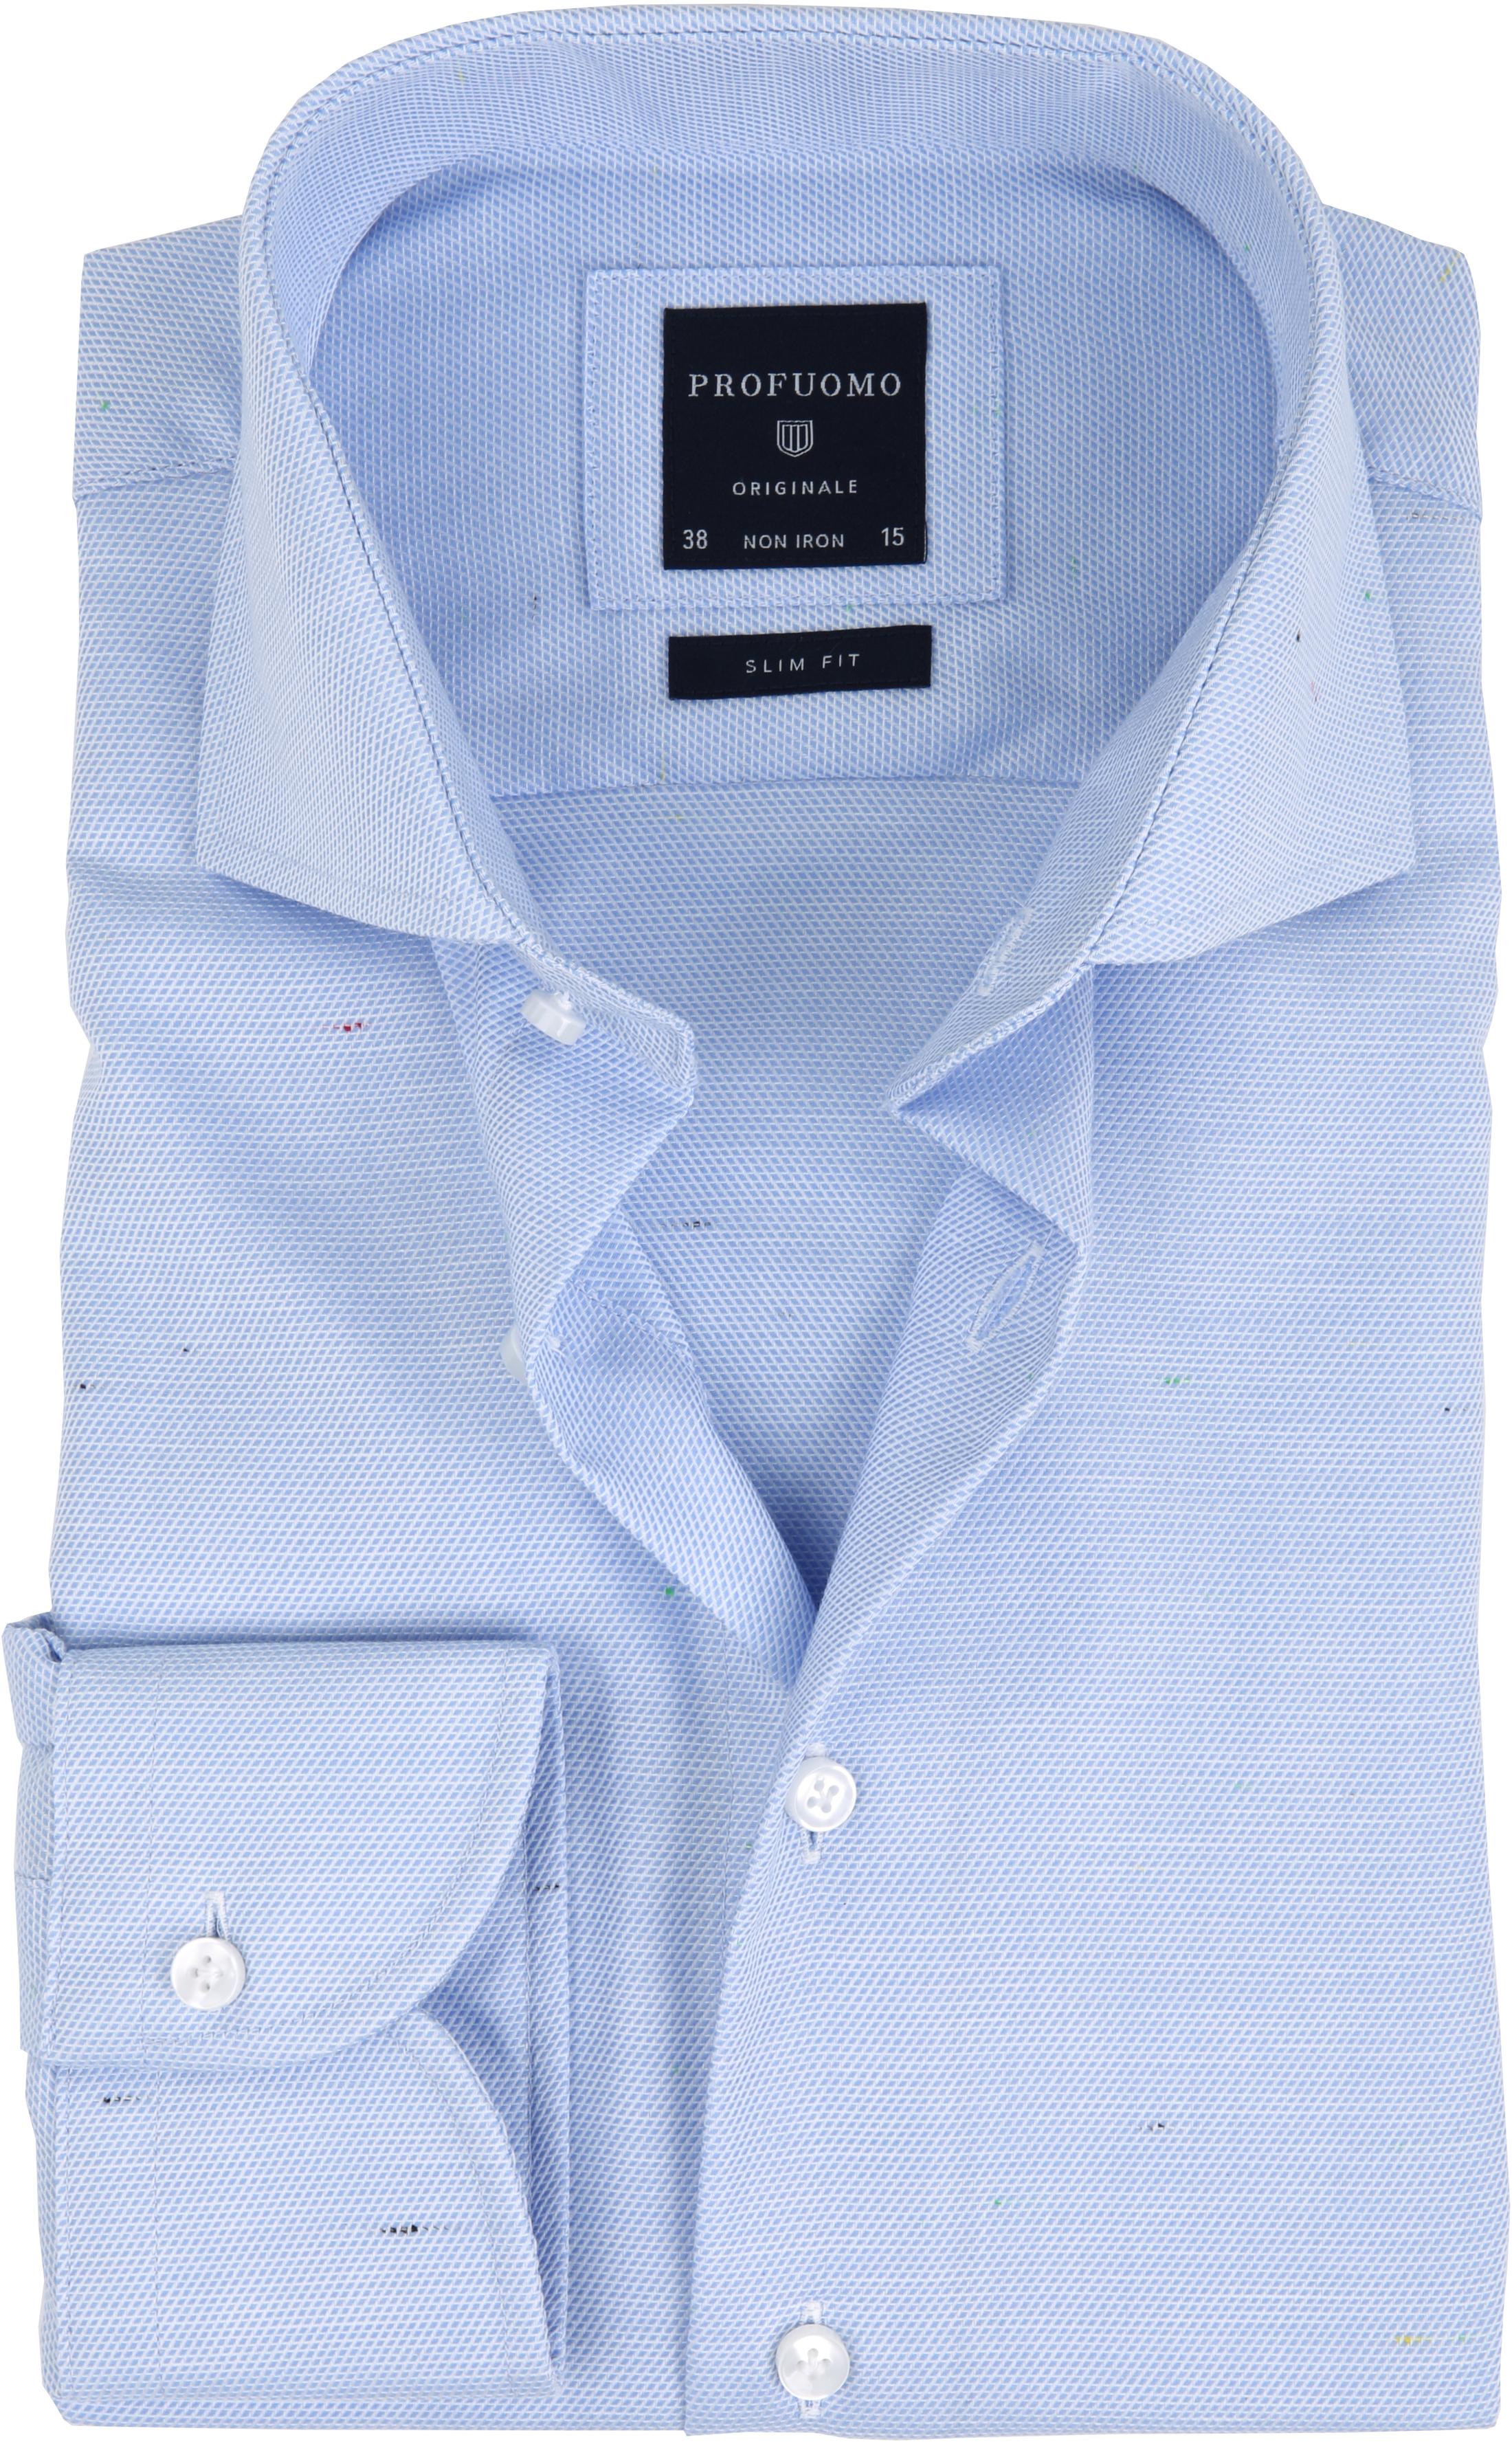 Profuomo Overhemd Dessin Blauw CAW foto 0